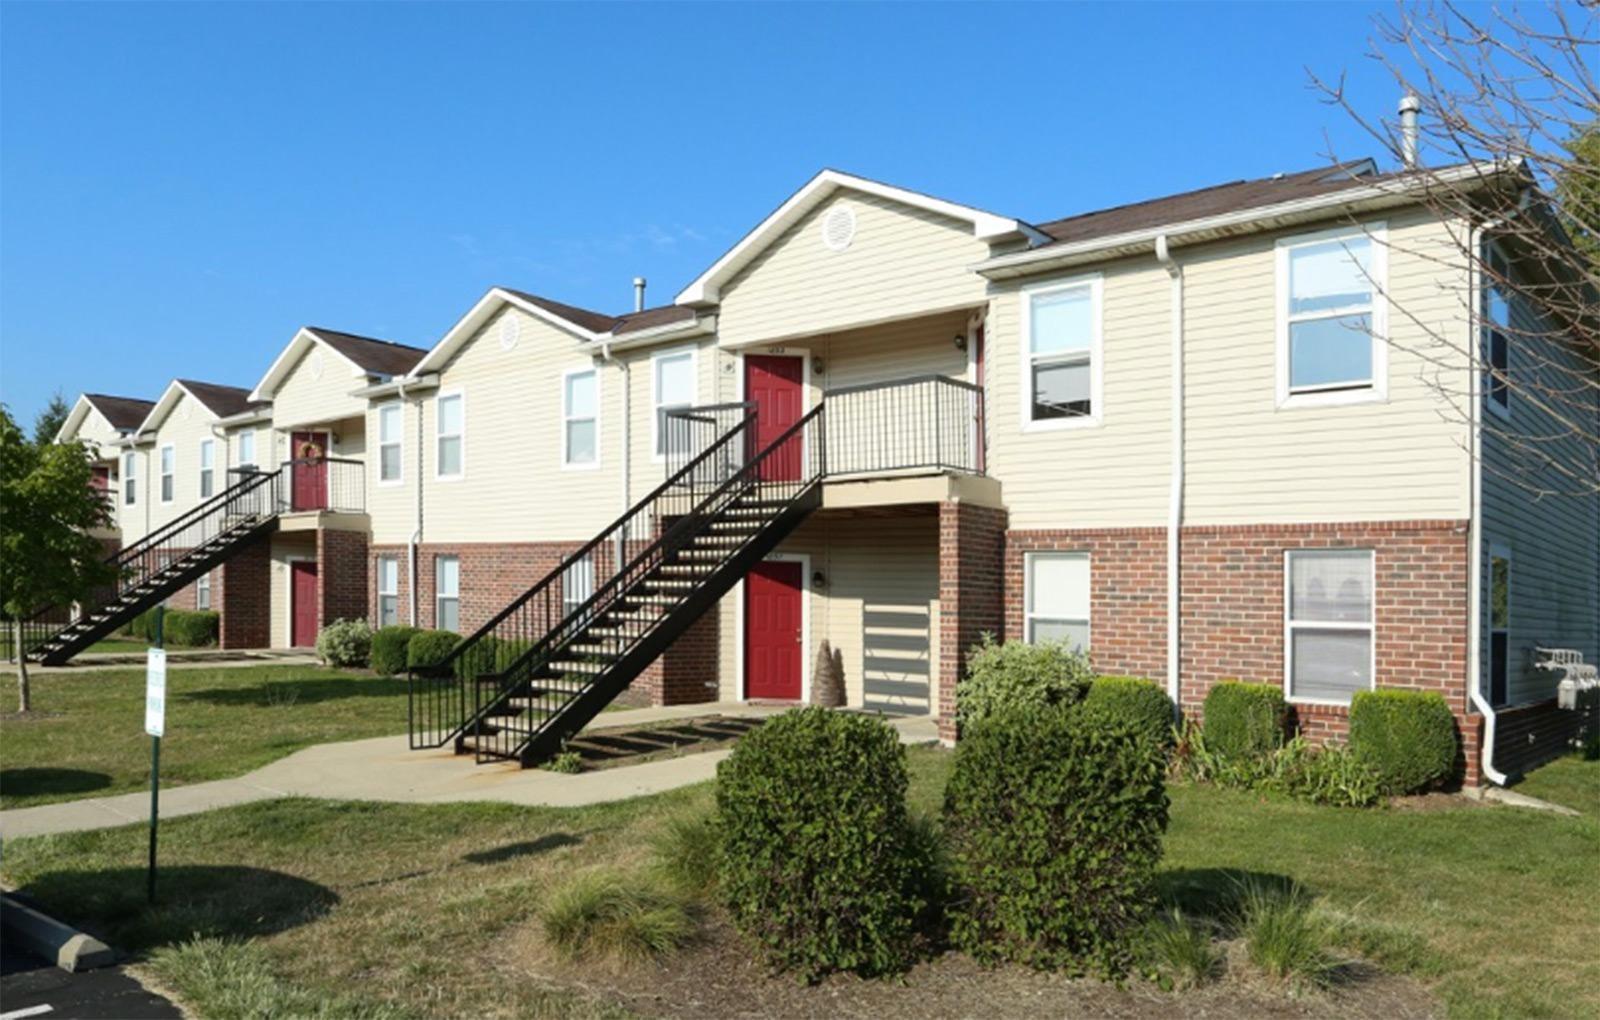 Apartment building exterior_Cameron Creek Apartments, Galloway, OH 43119